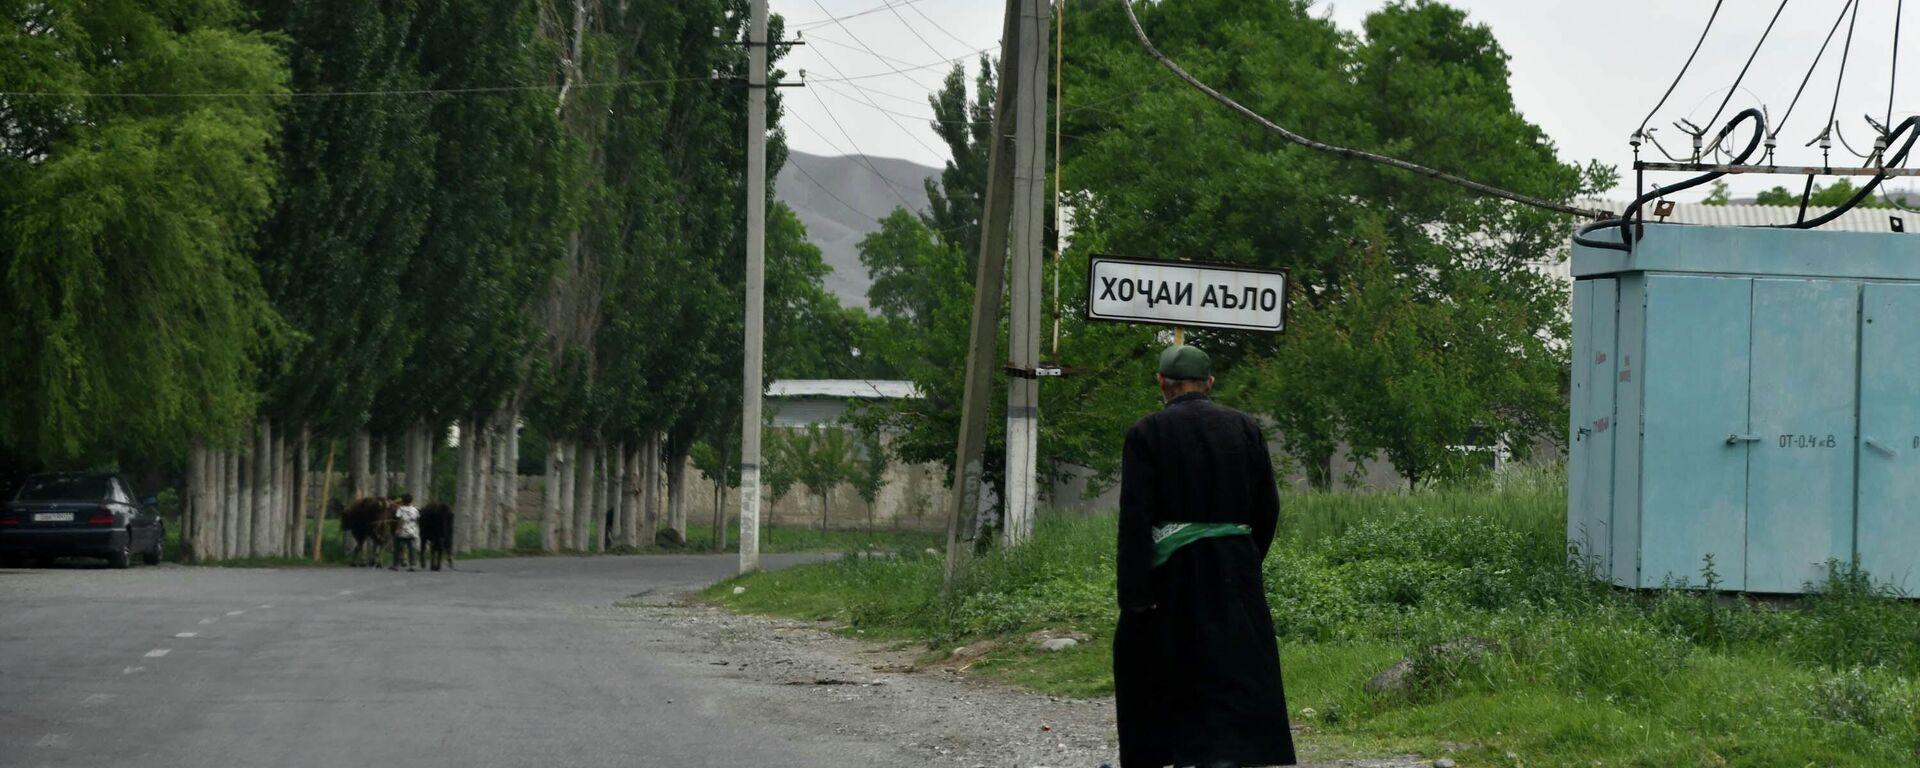 Кишлак Ходжаи Аъло на границе Таджикистана и Кыргызстана - Sputnik Таджикистан, 1920, 28.05.2021